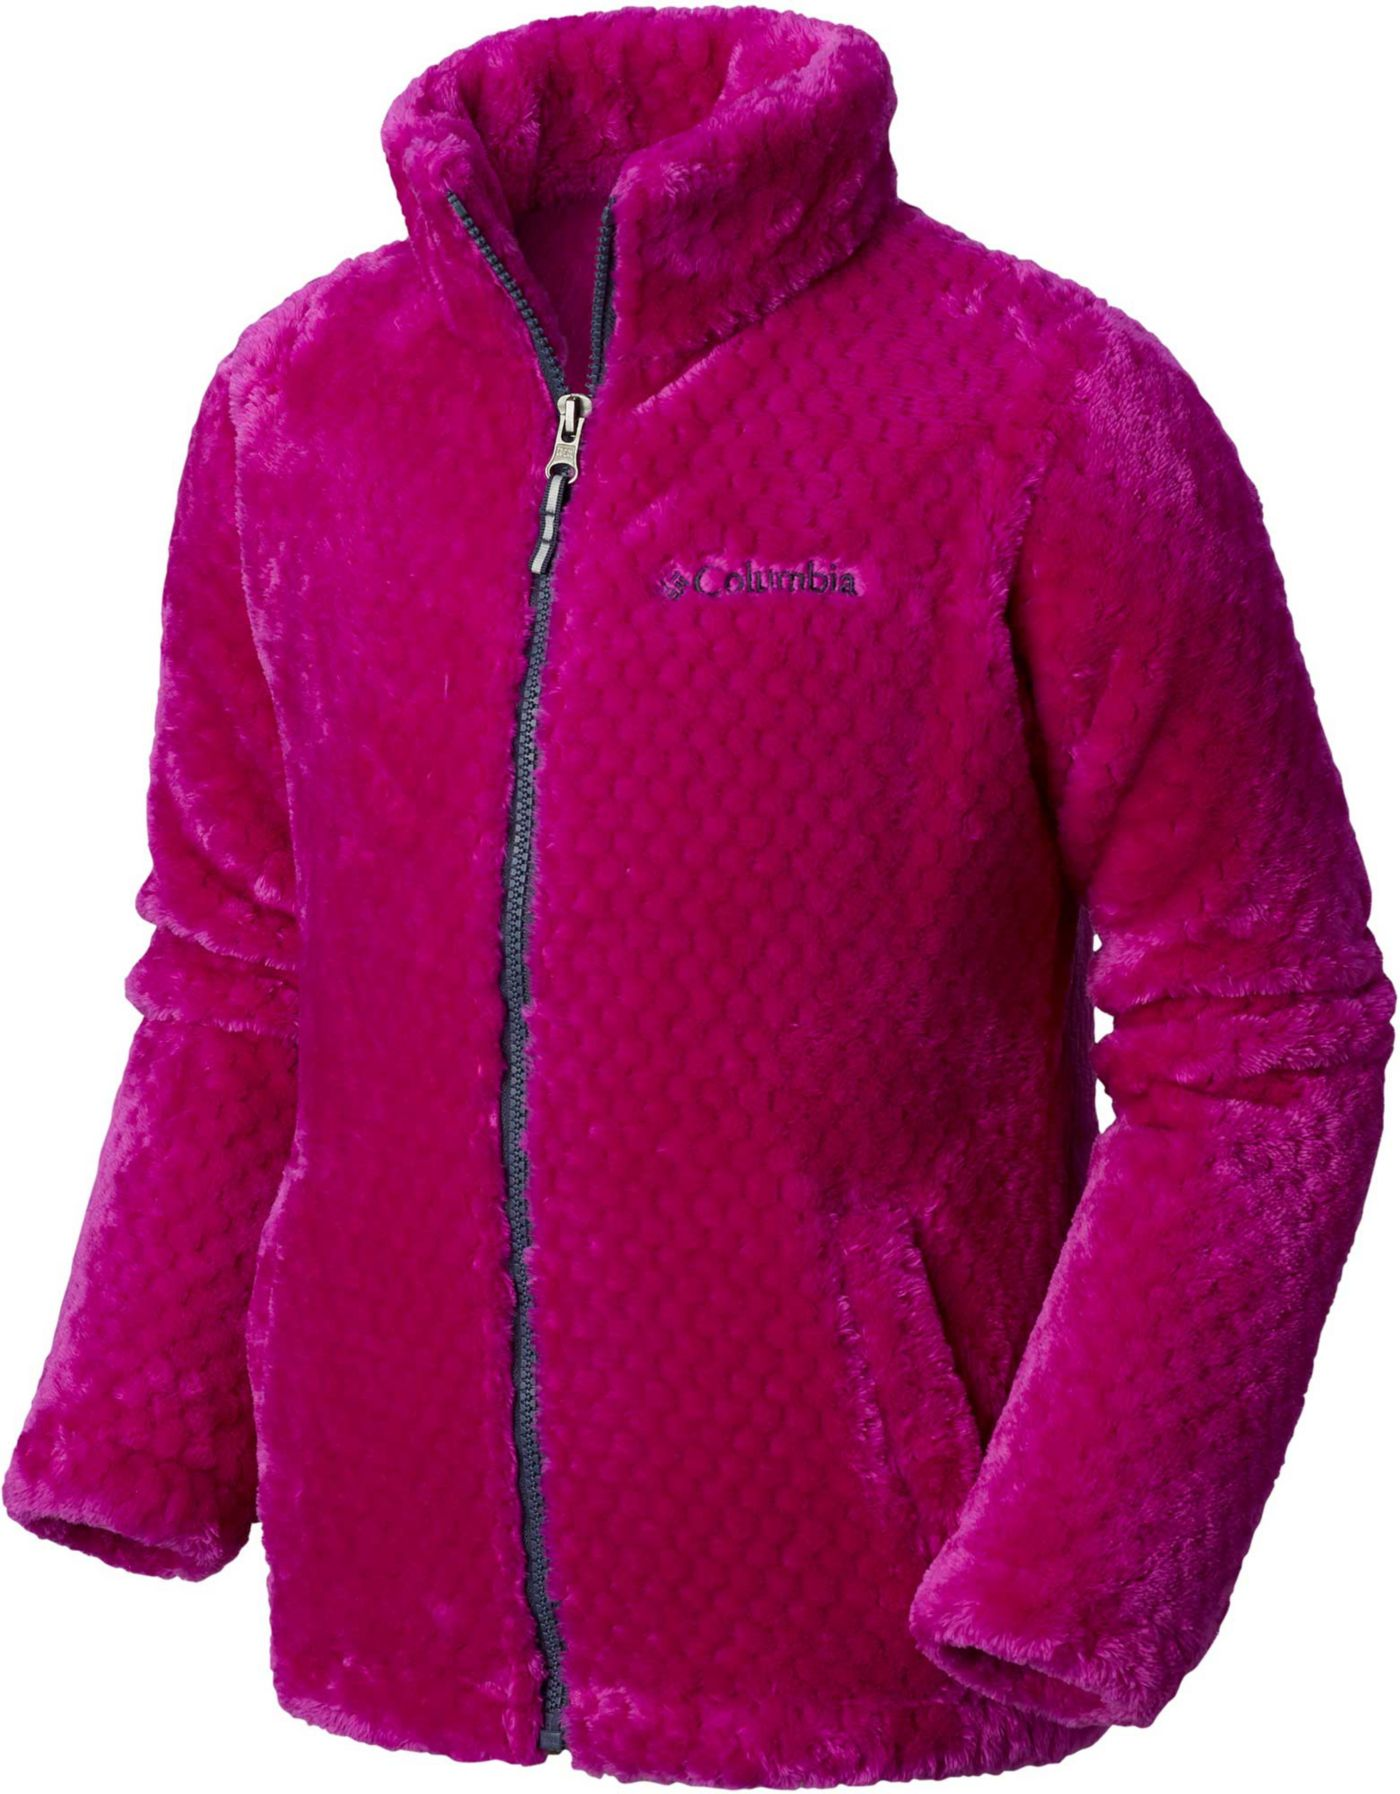 Columbia Girls' Fluffy Fleece Full Zip Jacket